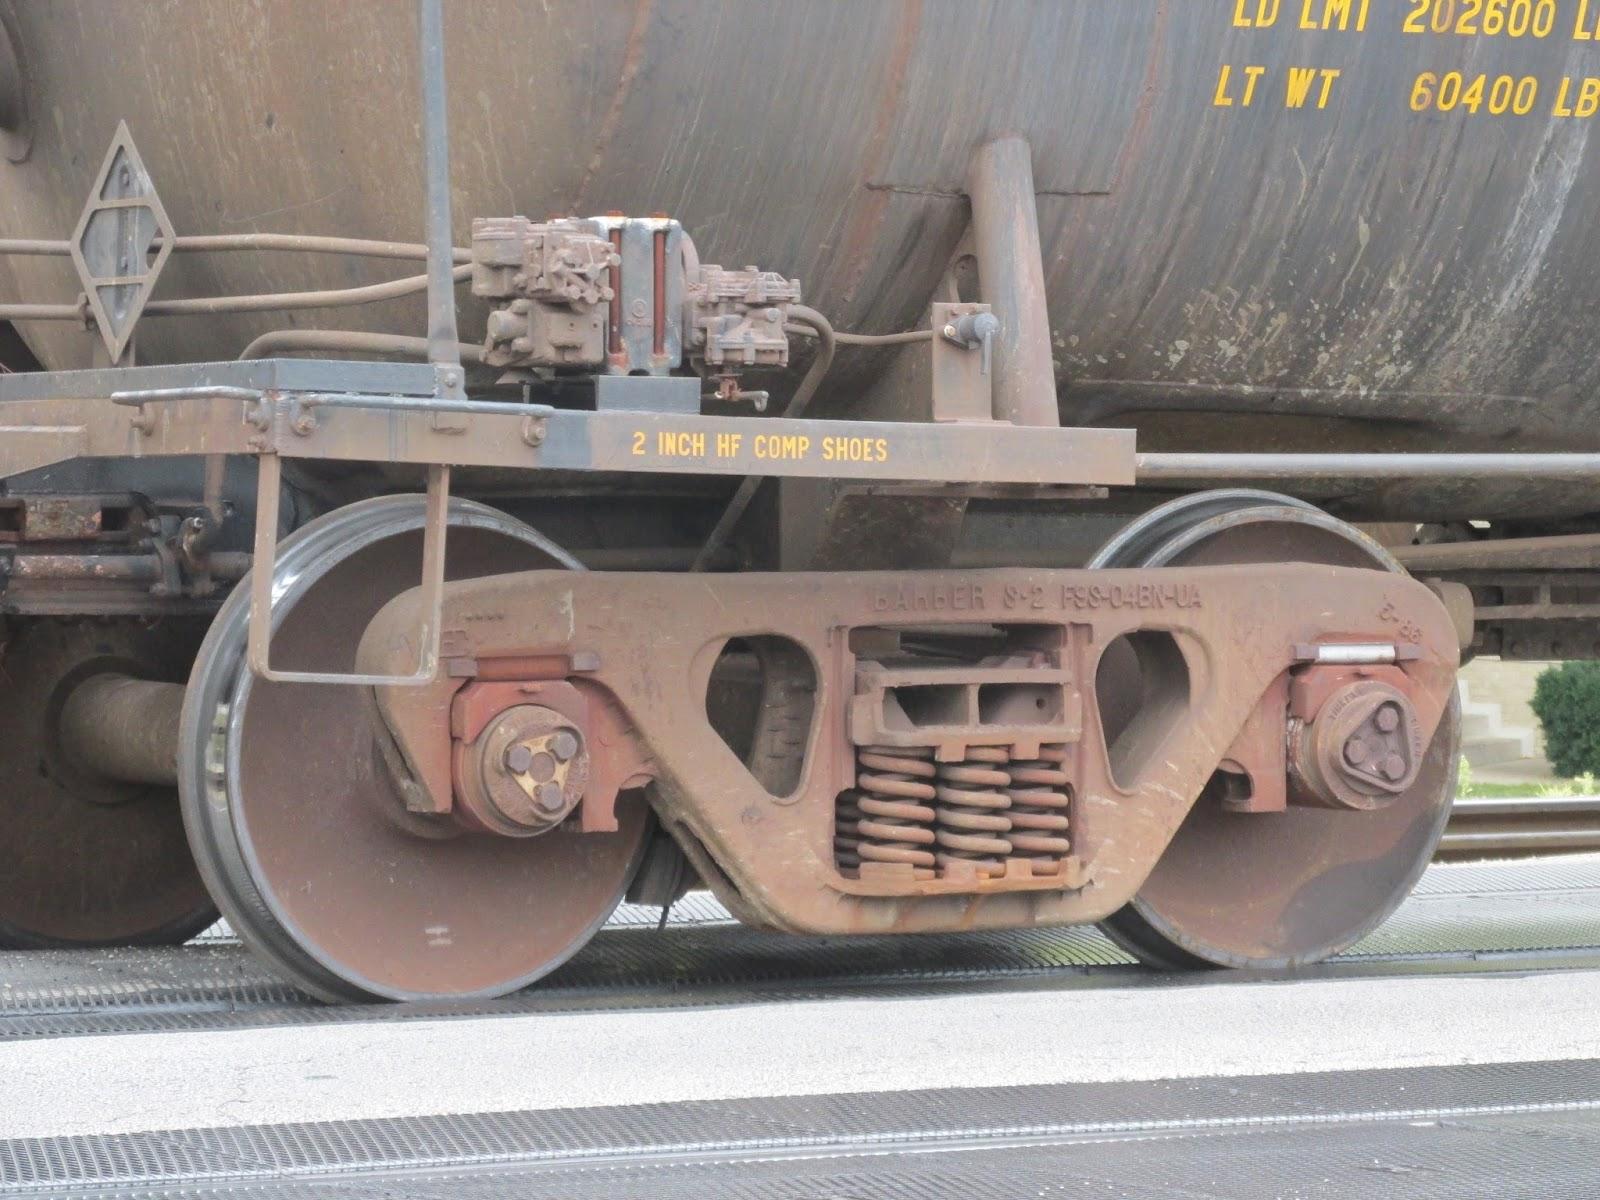 Eddie's Rail Fan Page: A modern roller bearing freight car